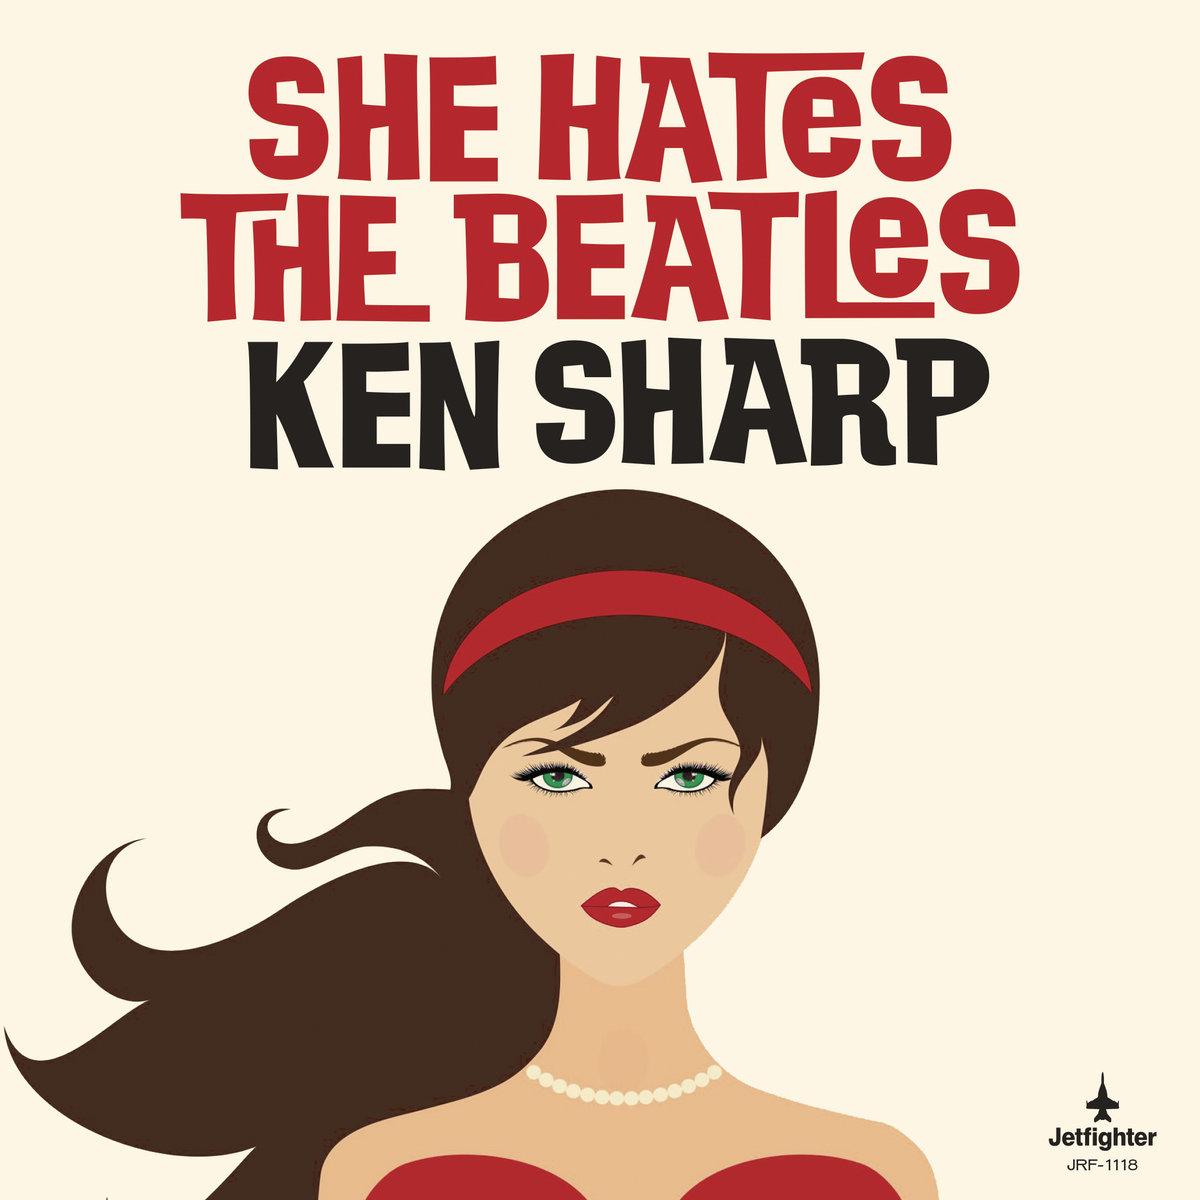 ken sharp she hates the beatles cover